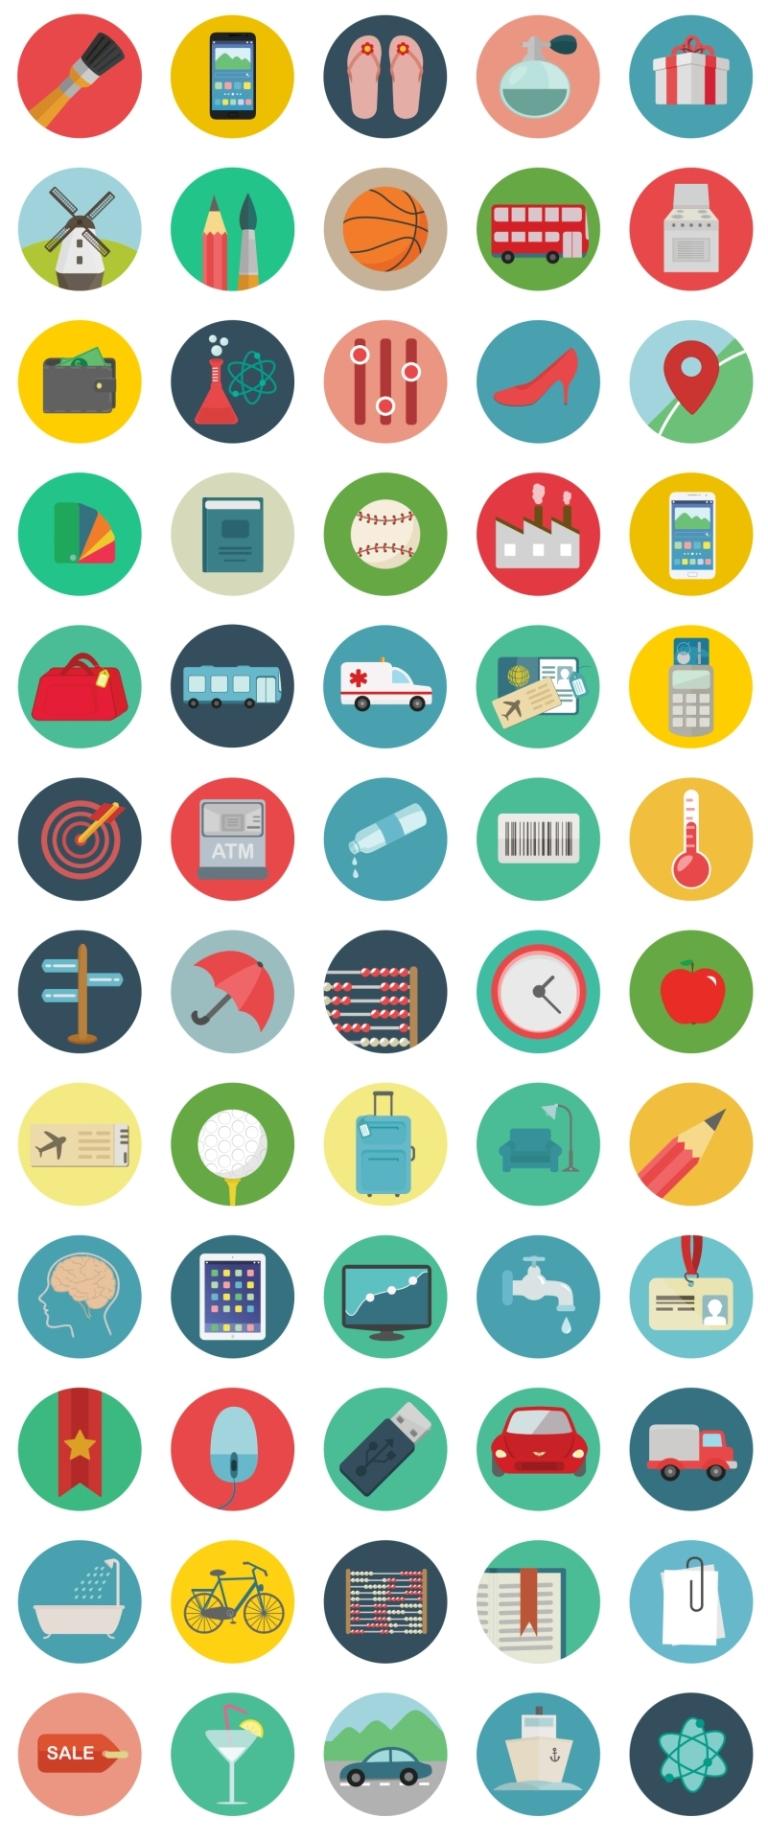 60 Ücretsiz Düz Yuvarlak #Simgeler (#Roundicons) - http://goo.gl/nN8pvA